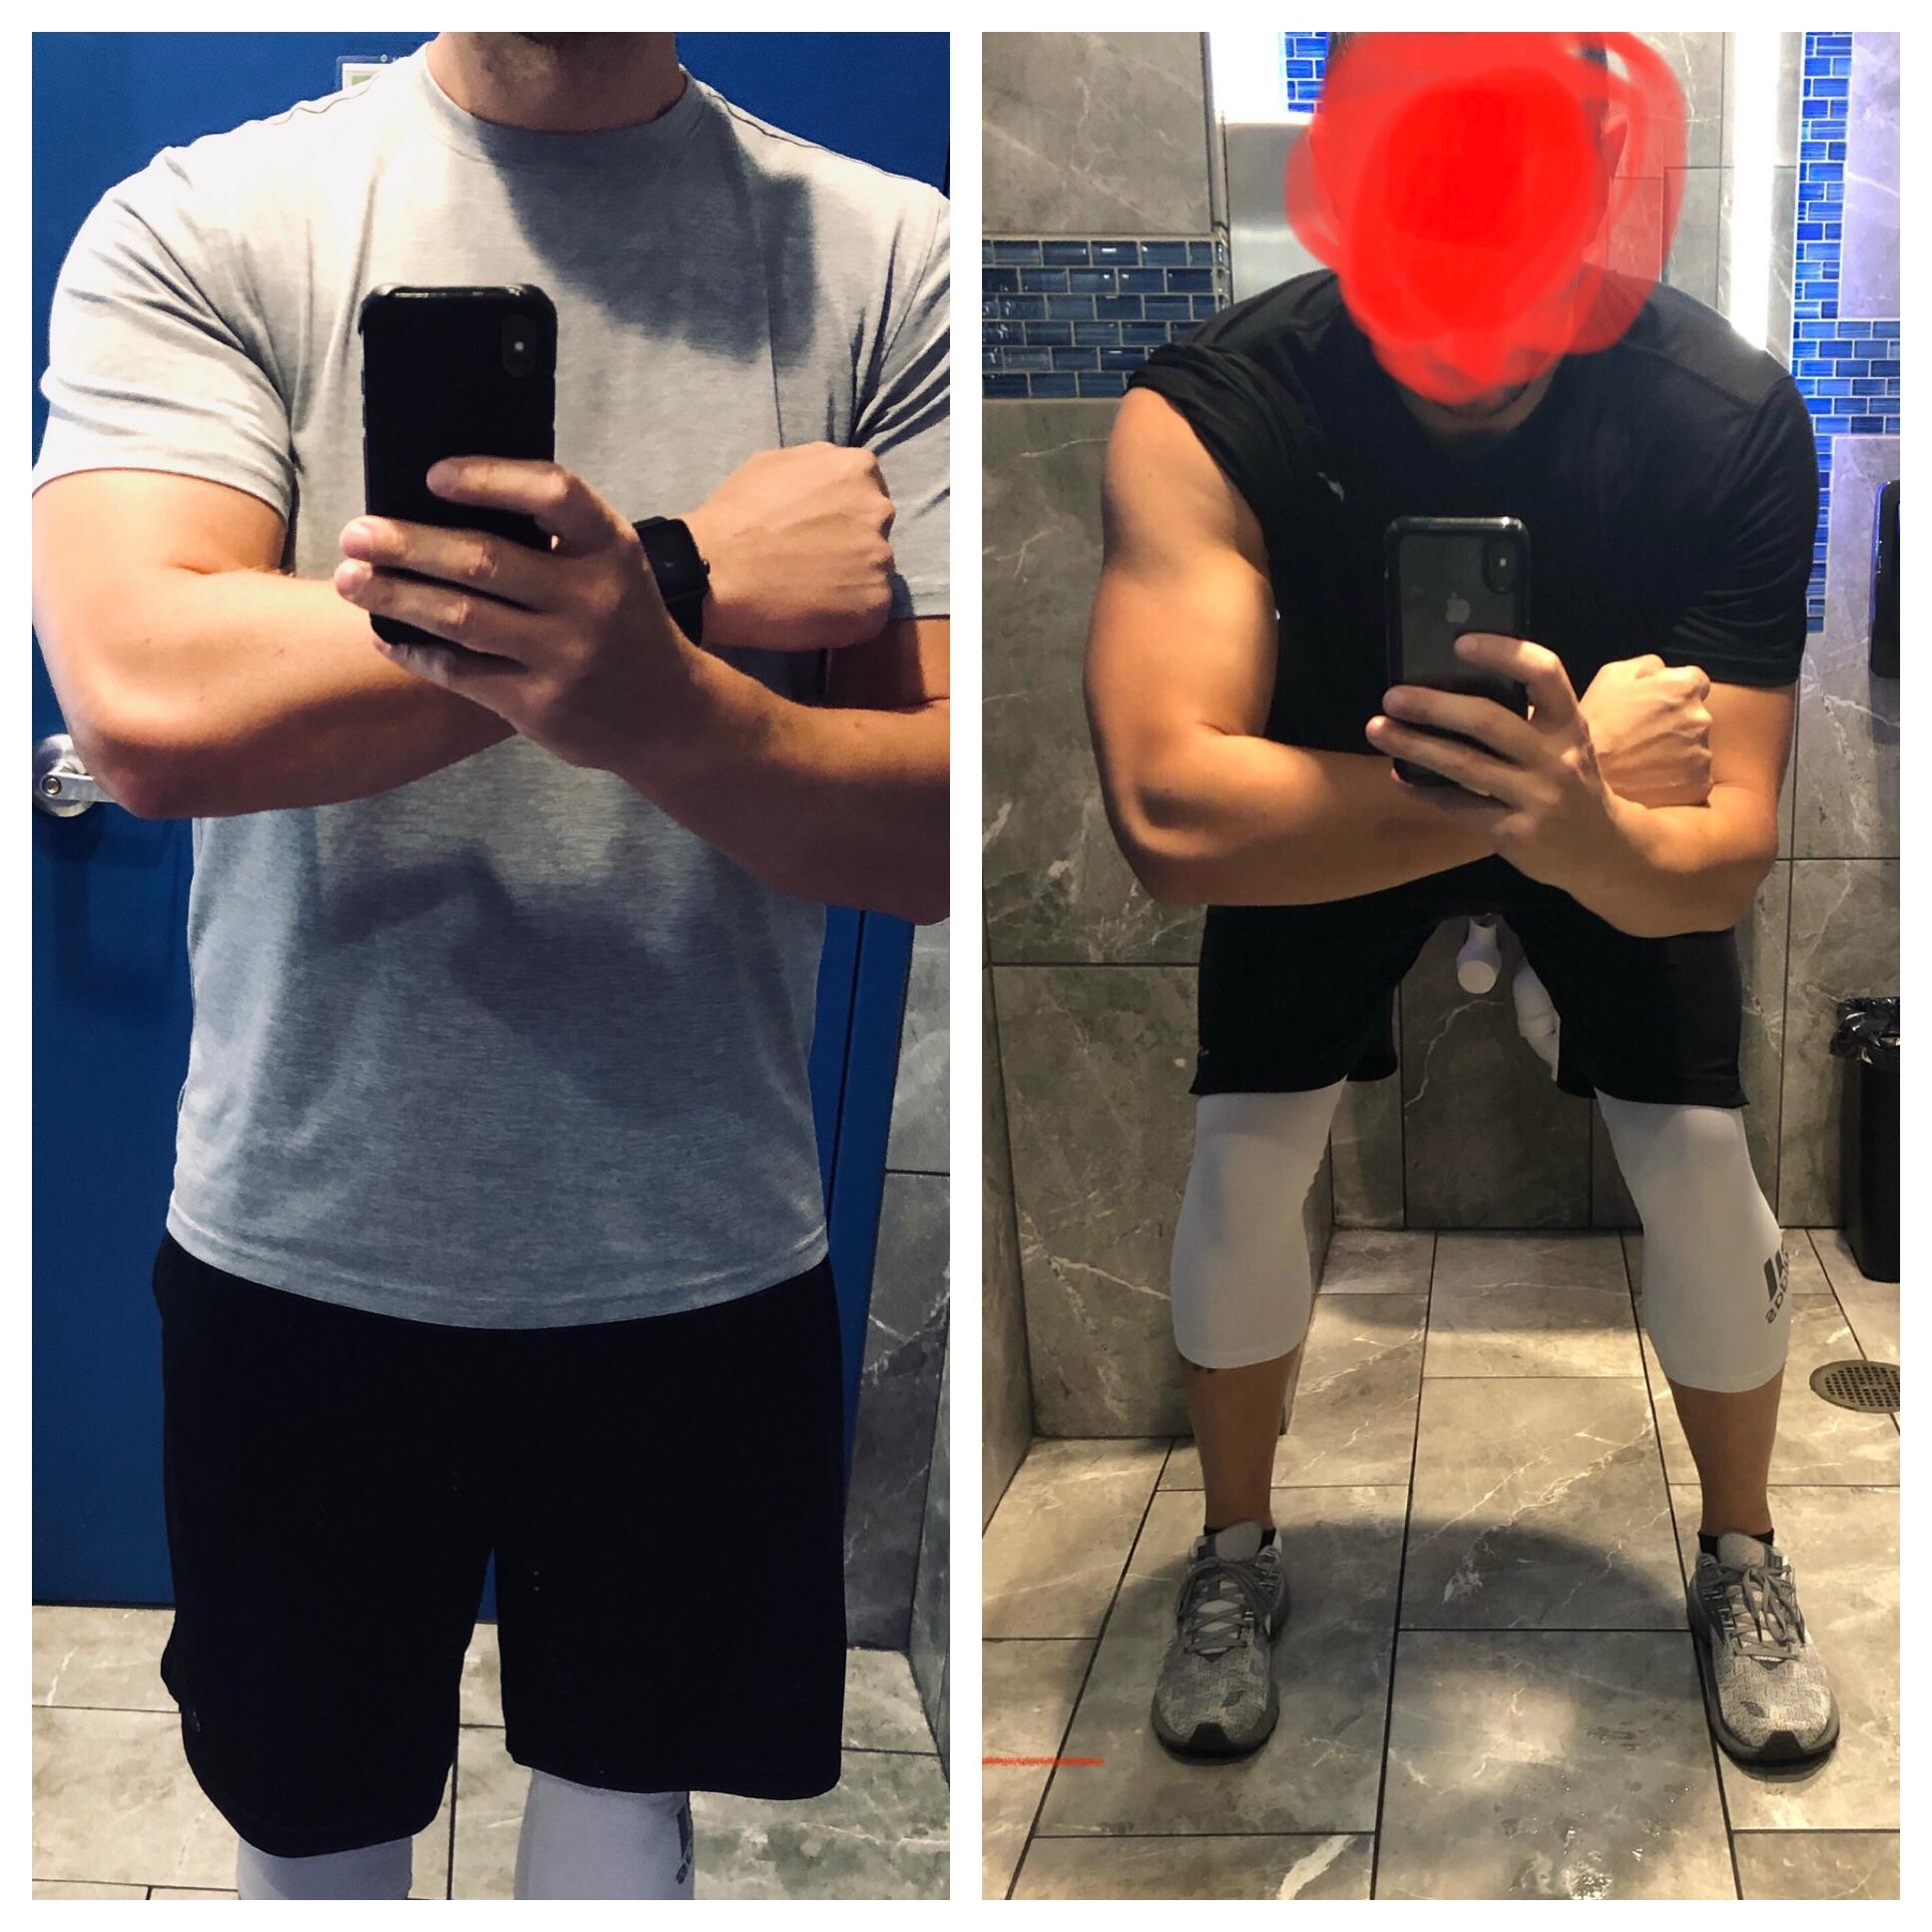 6 foot 1 Male 20 lbs Fat Loss 220 lbs to 200 lbs